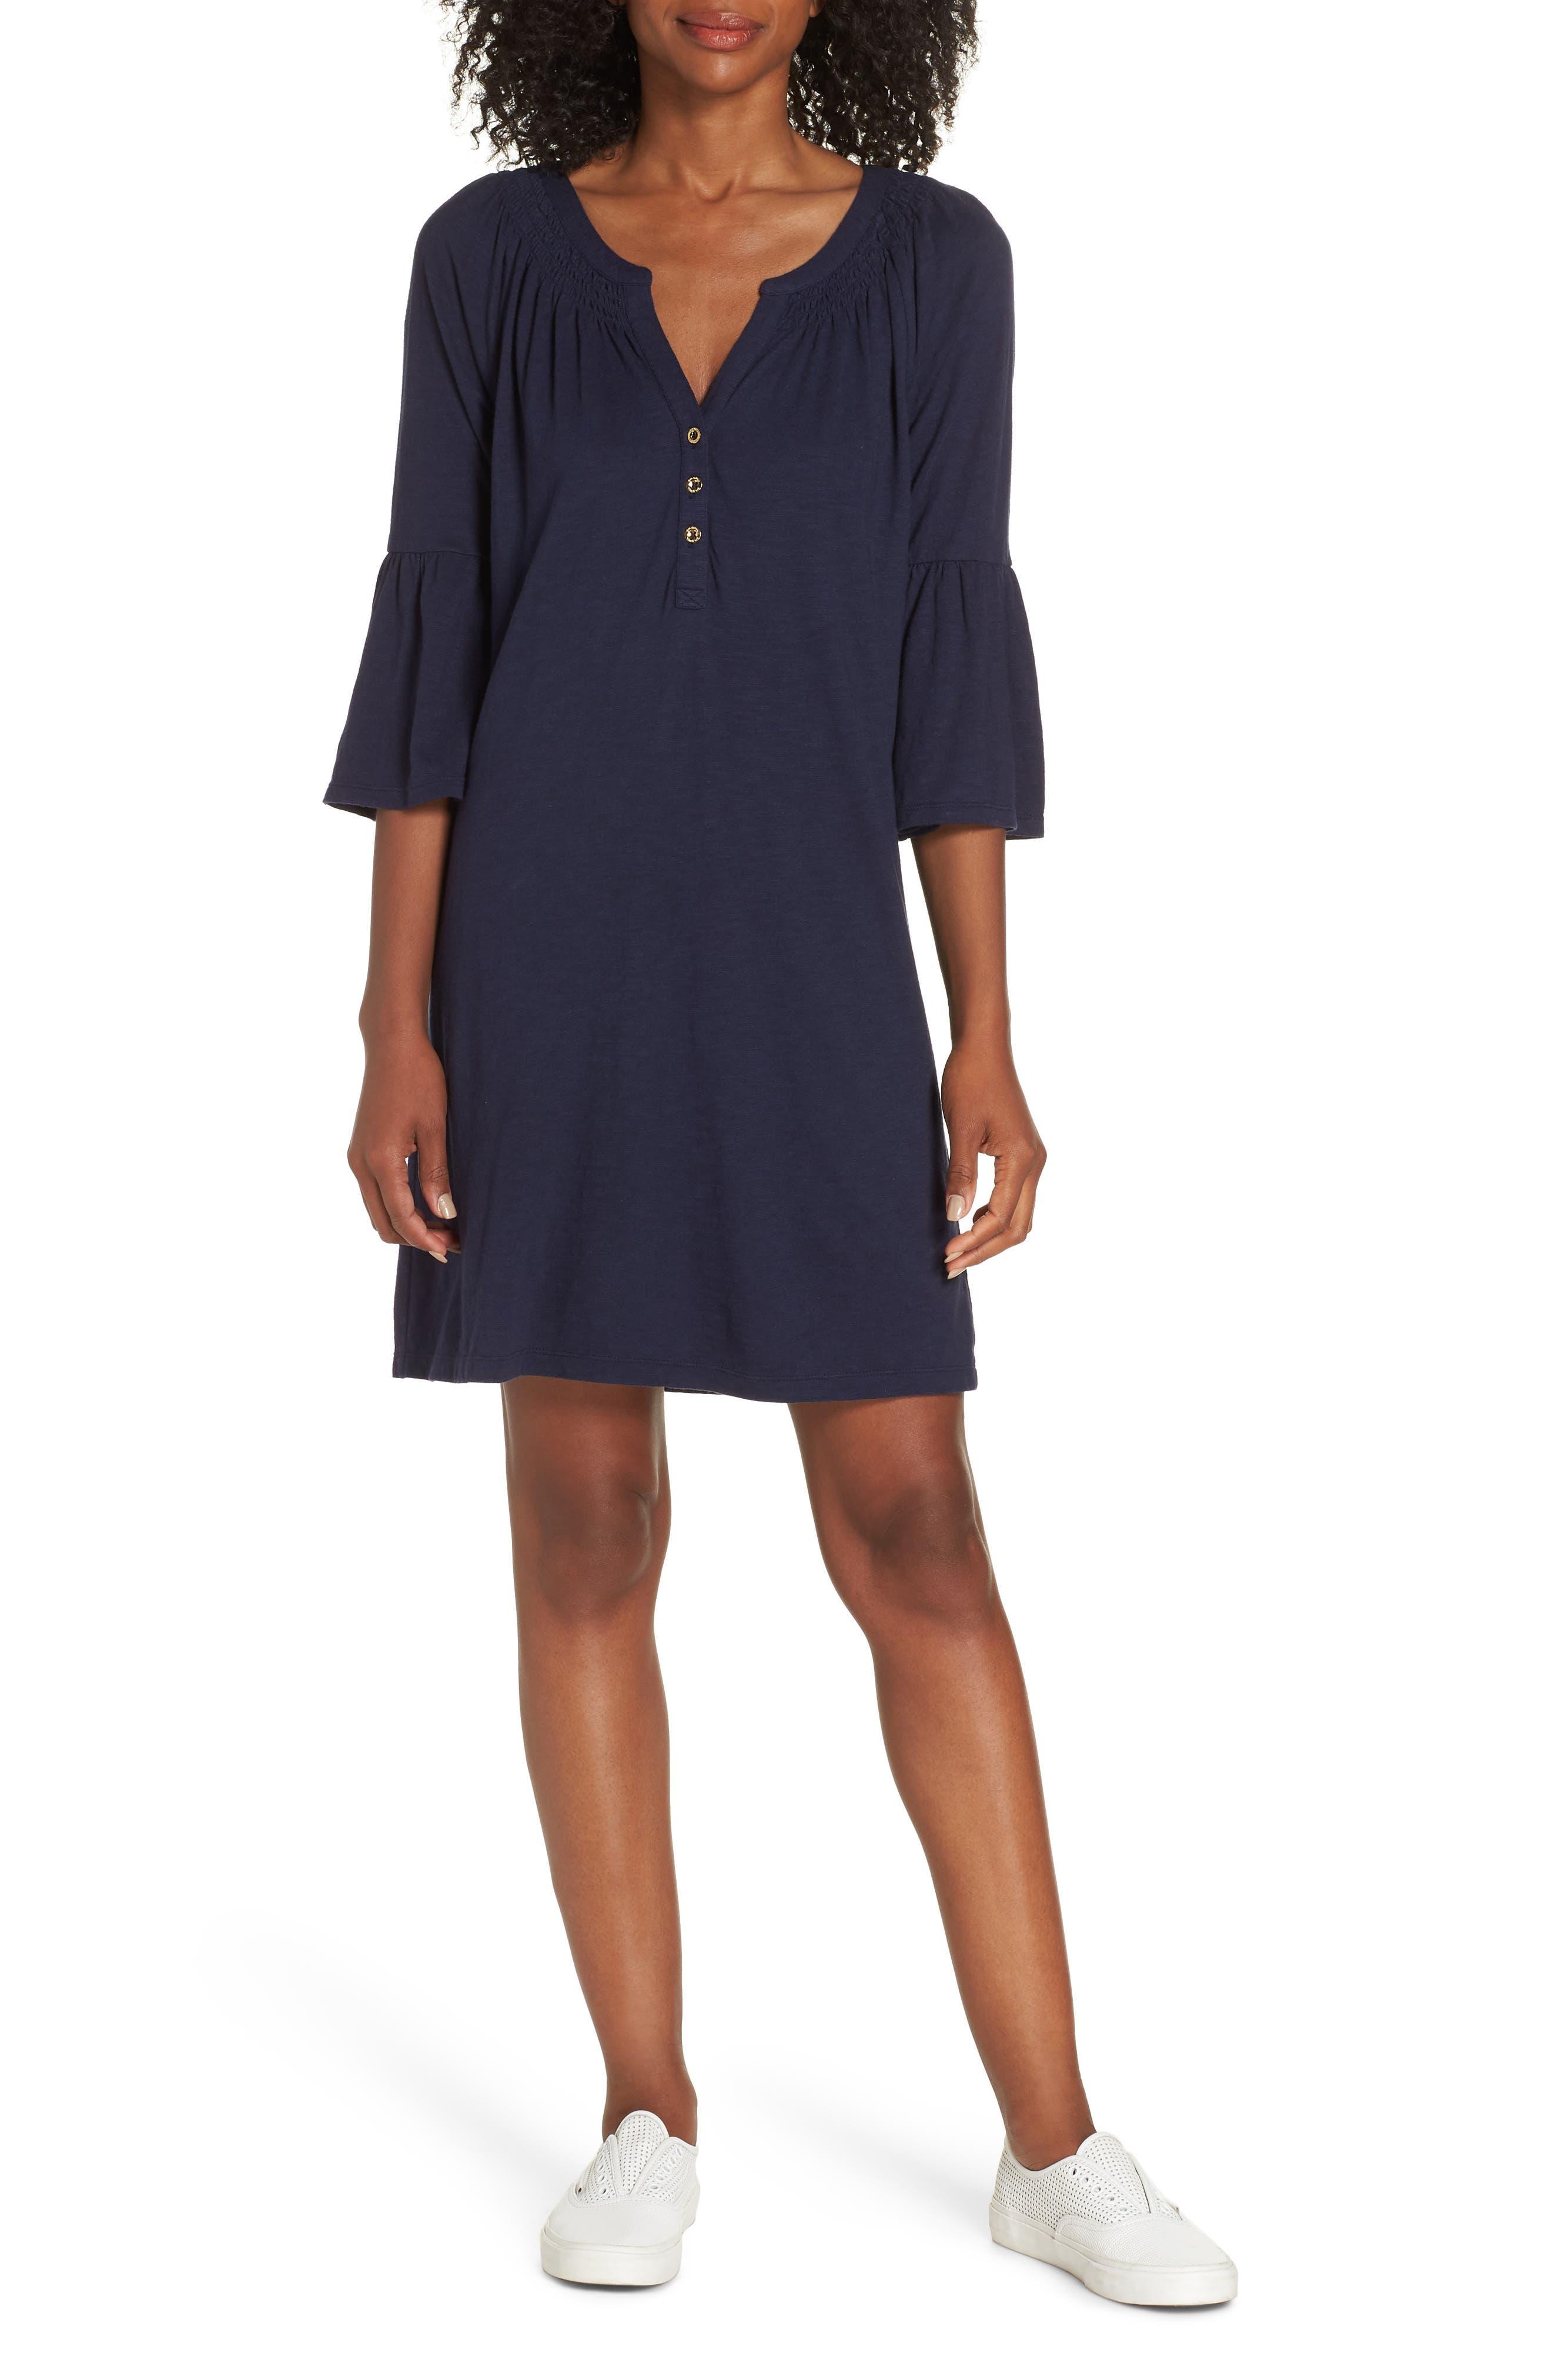 Lilly Pulitzer Teigen Tunic Dress, Blue